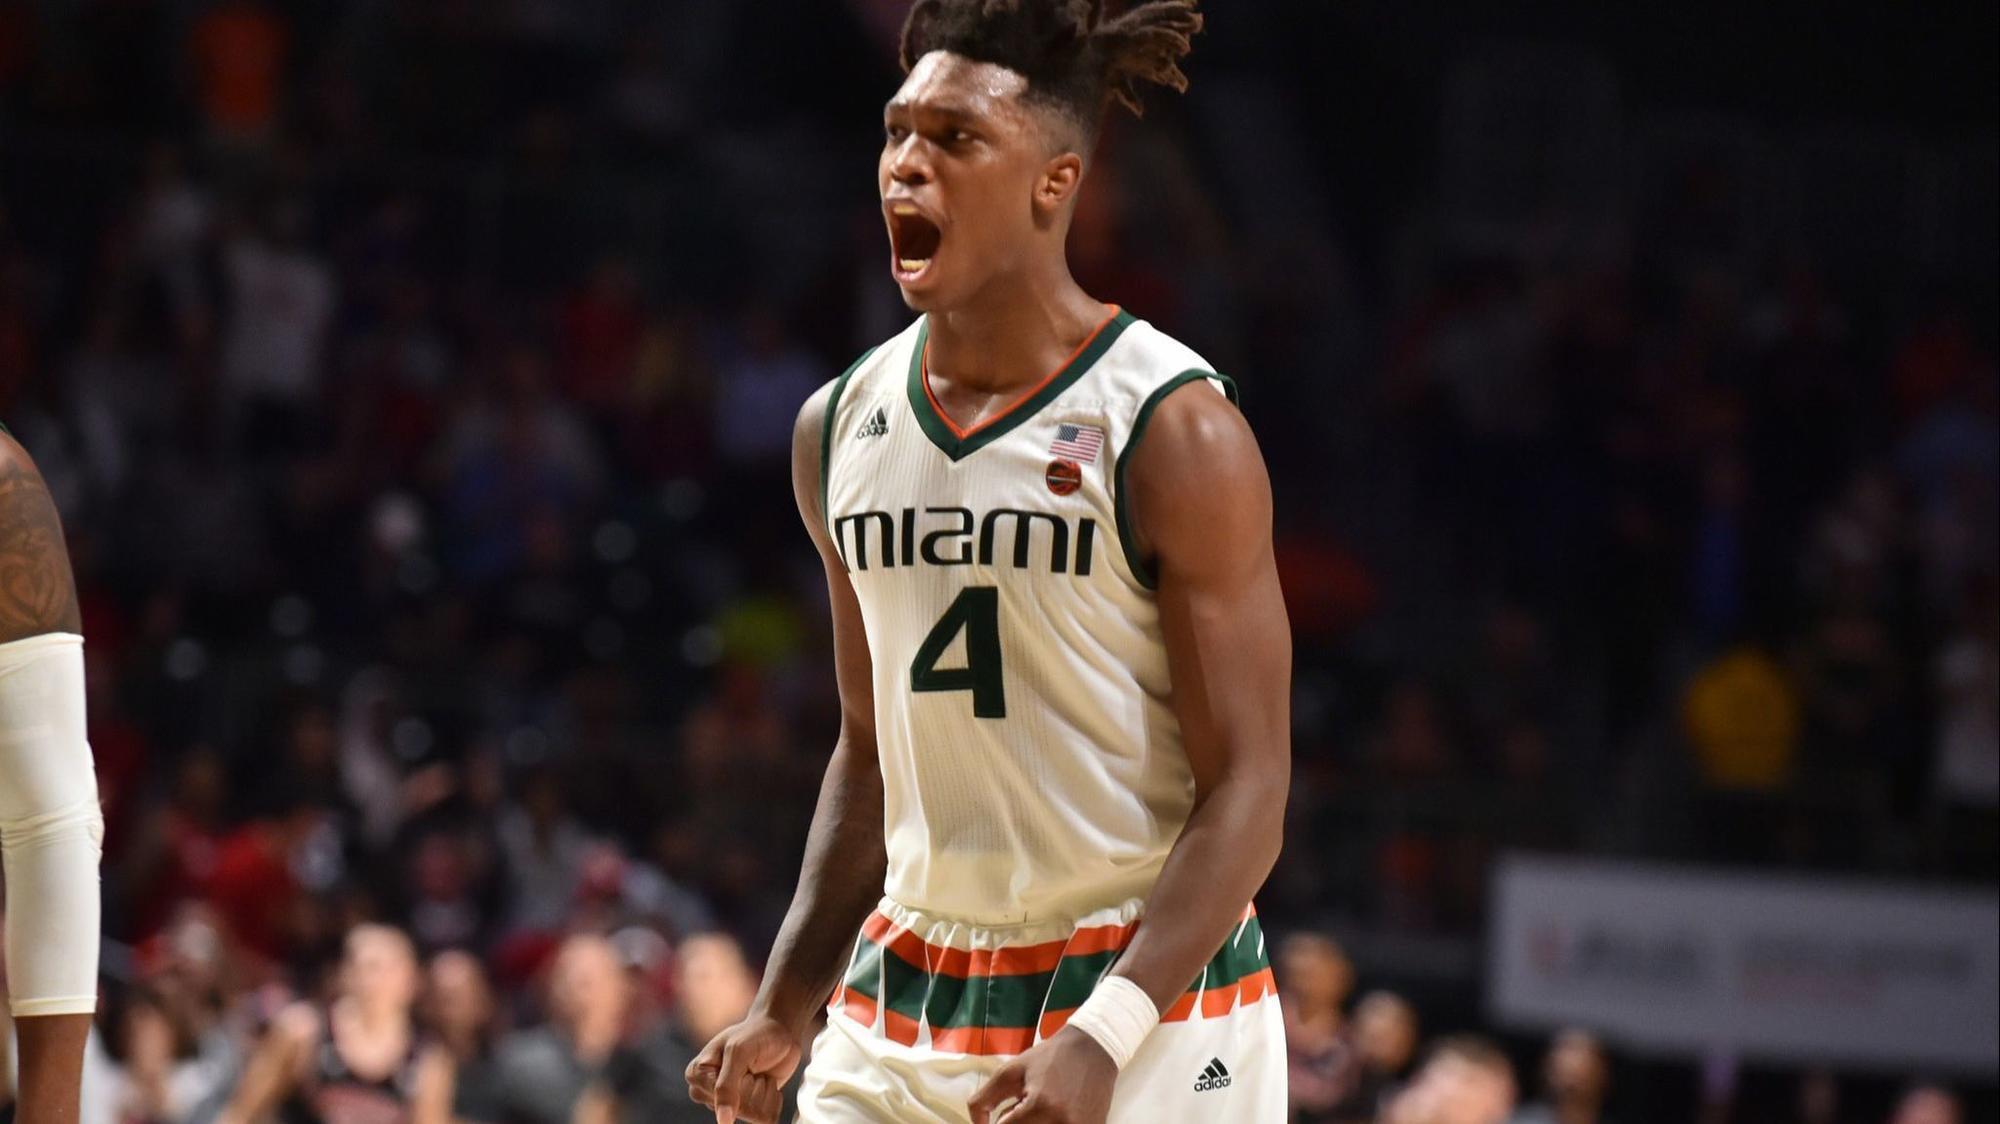 Fl-sp-um-hurricanes-basketball-lonnie-walker-20180614